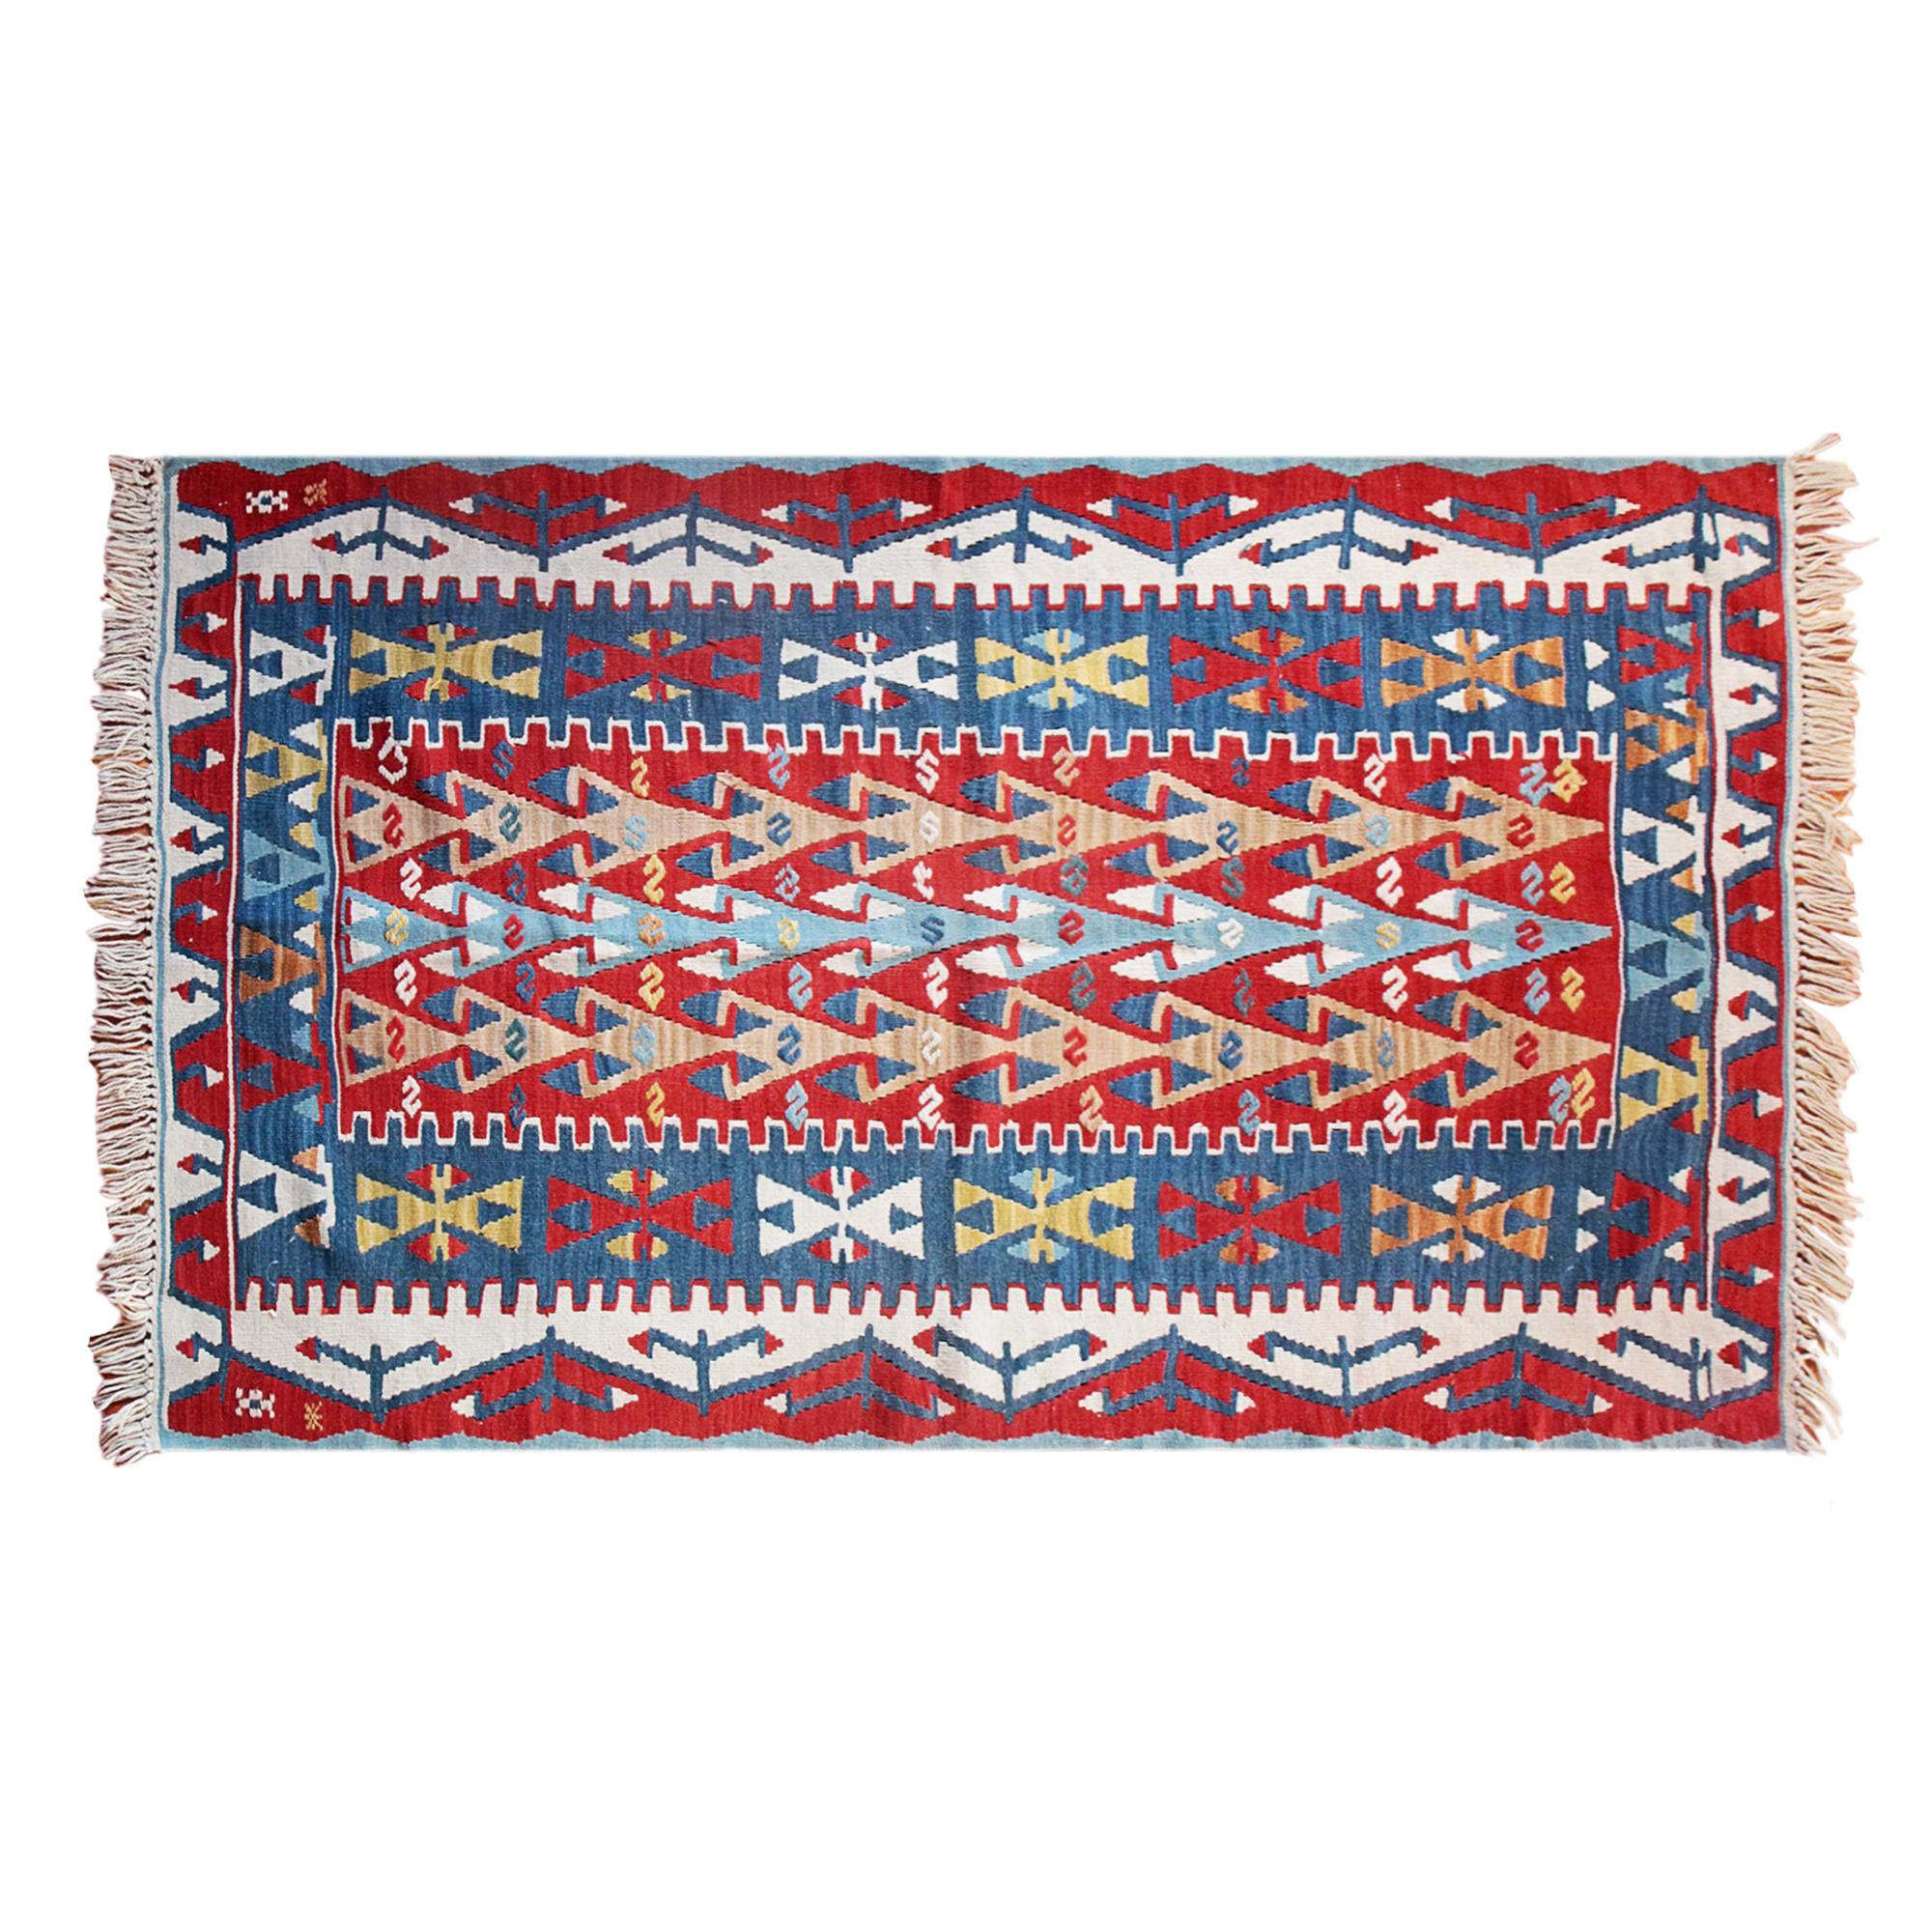 0210-klm-hand-woven-kilim